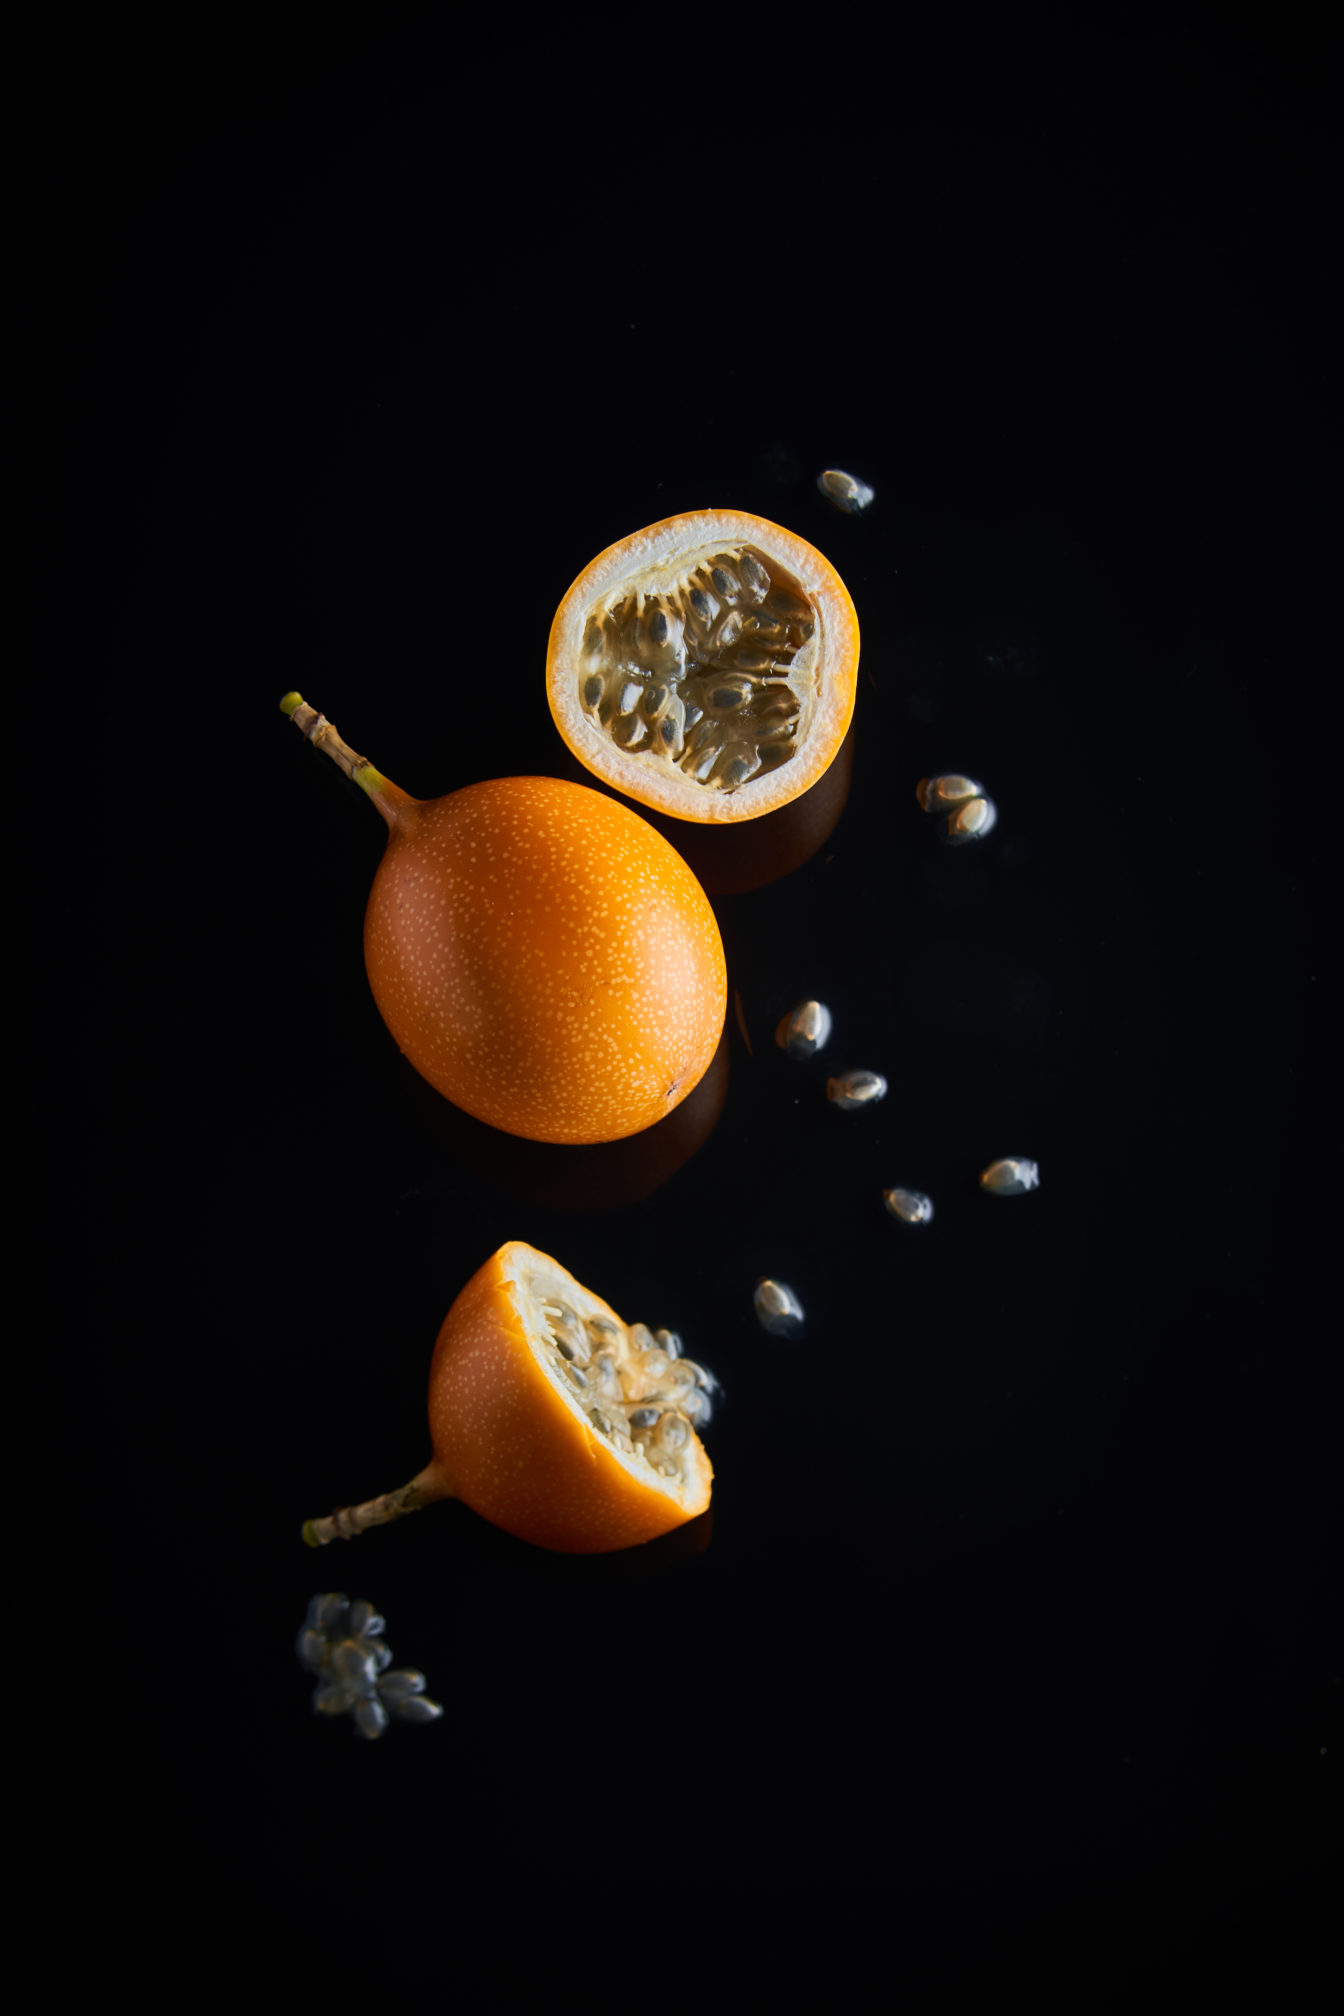 capexo-lilot-fruits-exotique-grenadille-colombie-perou